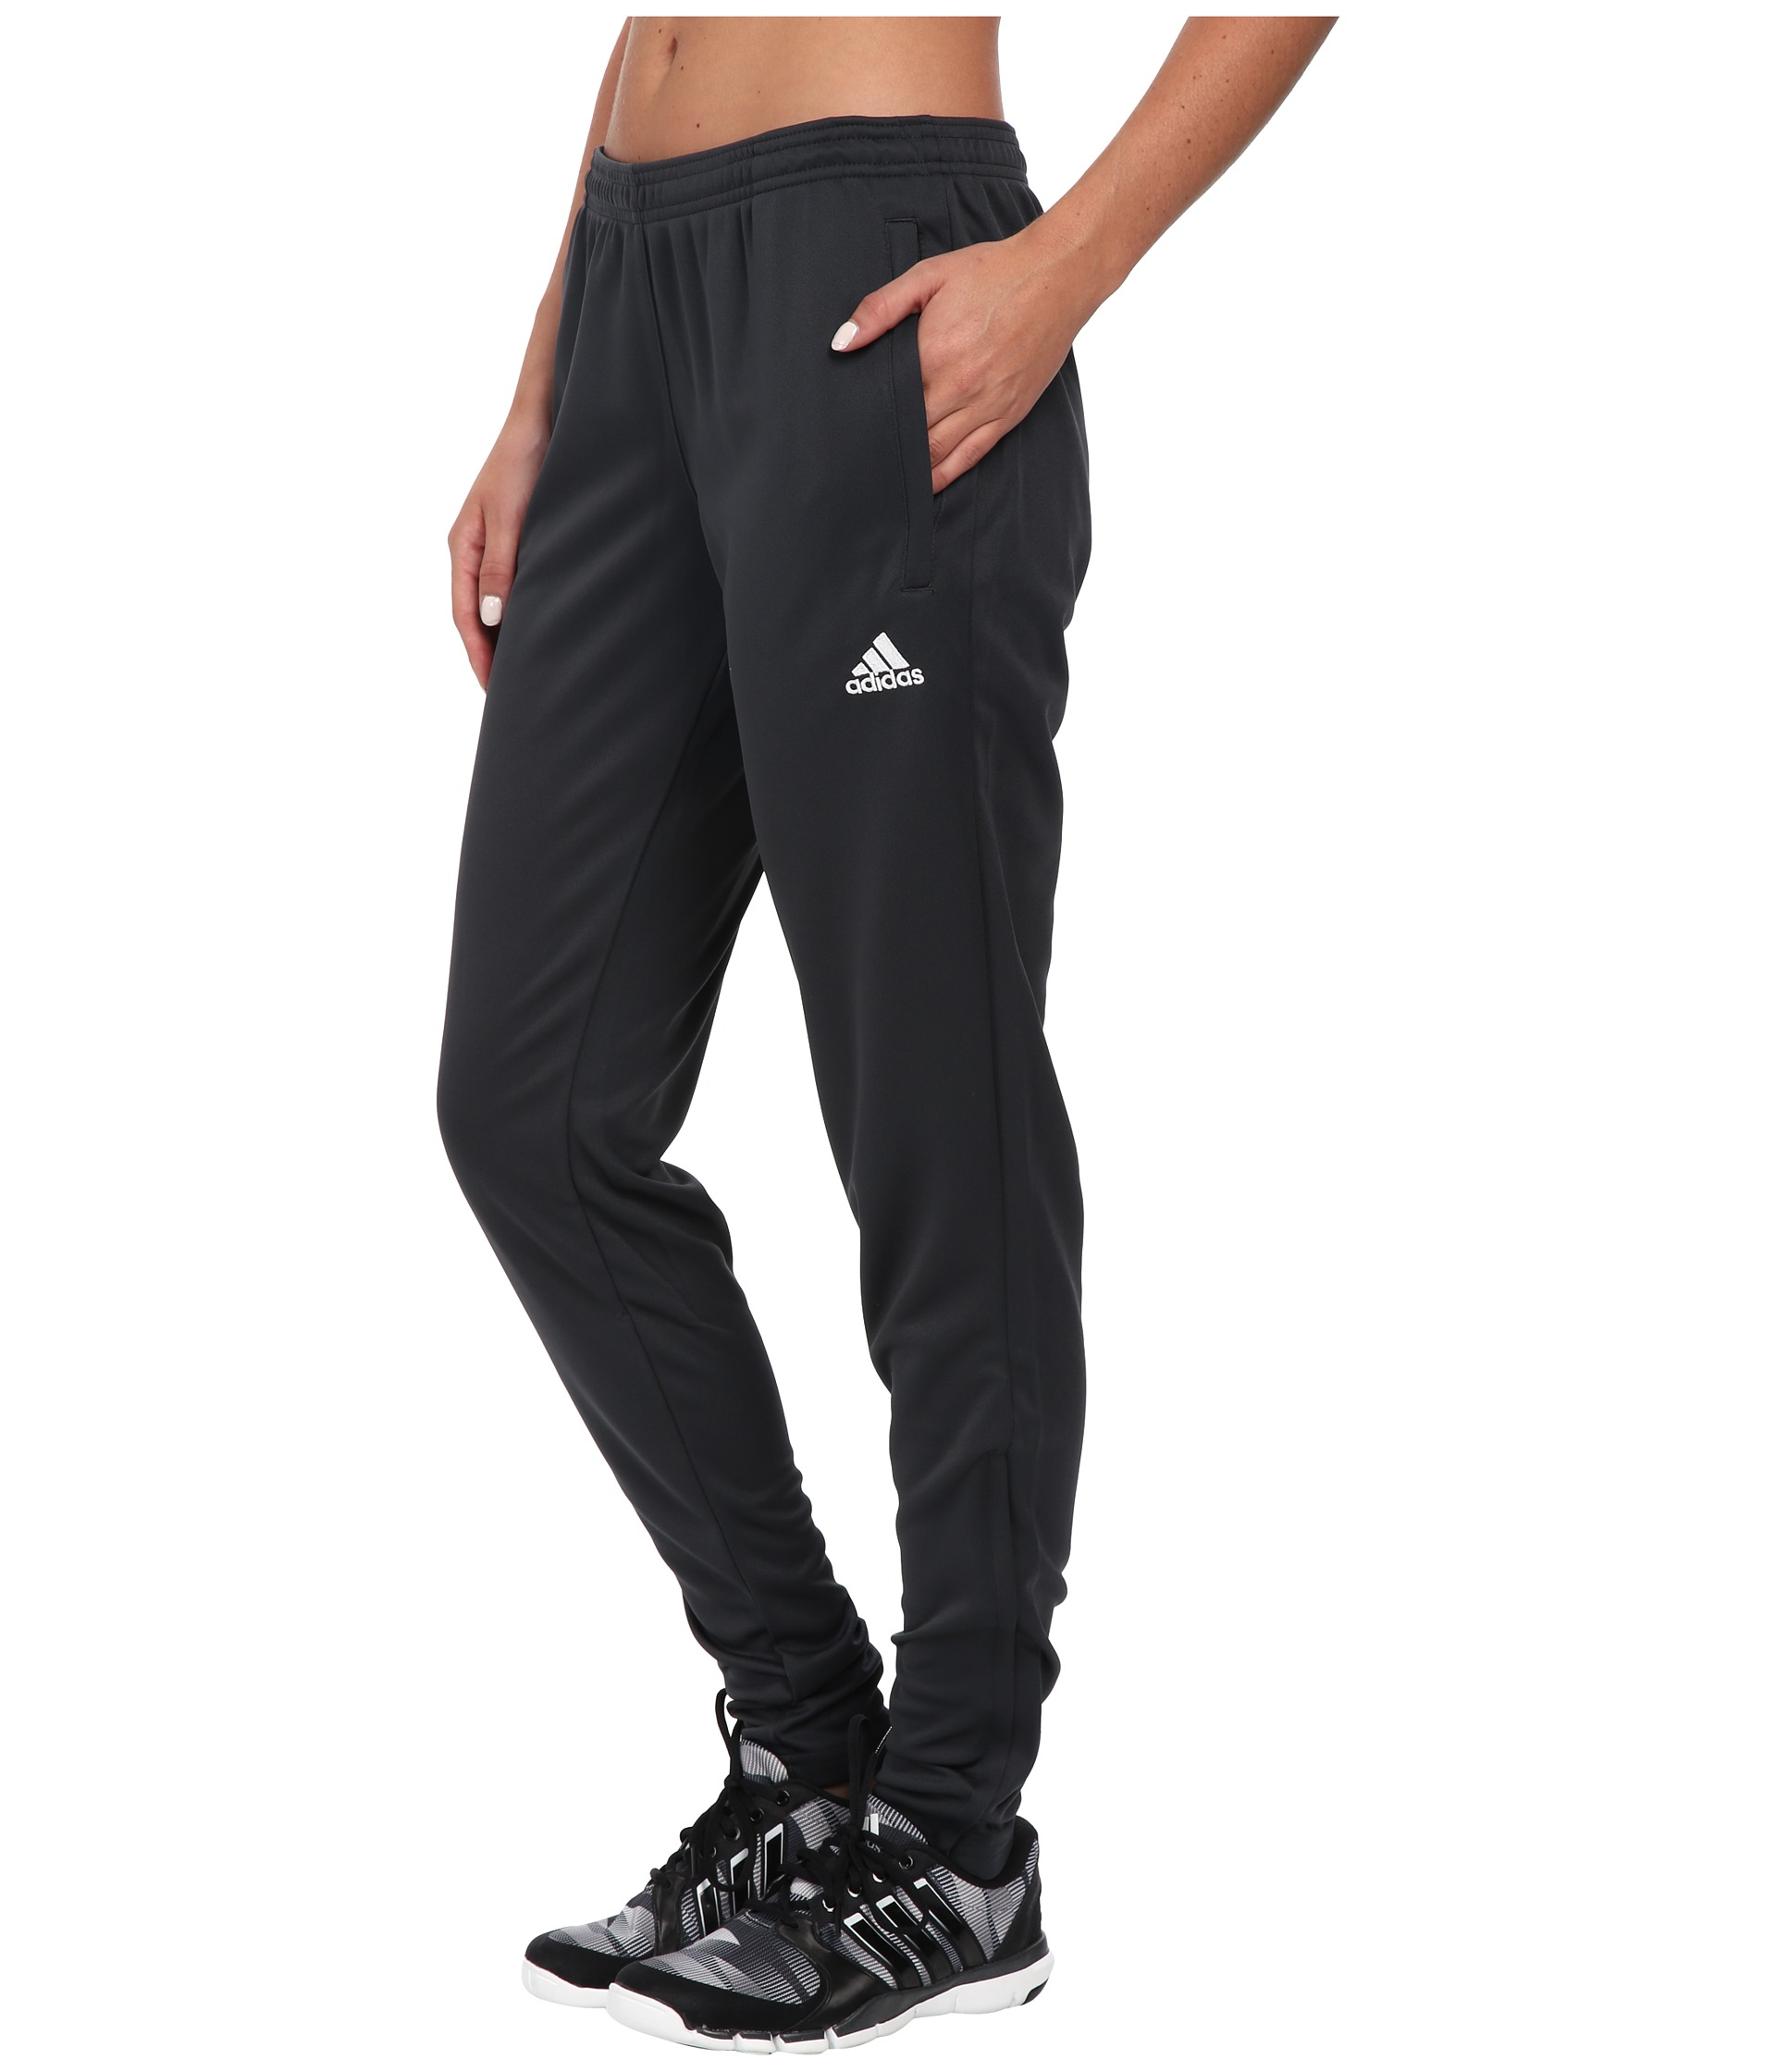 adidas core pants